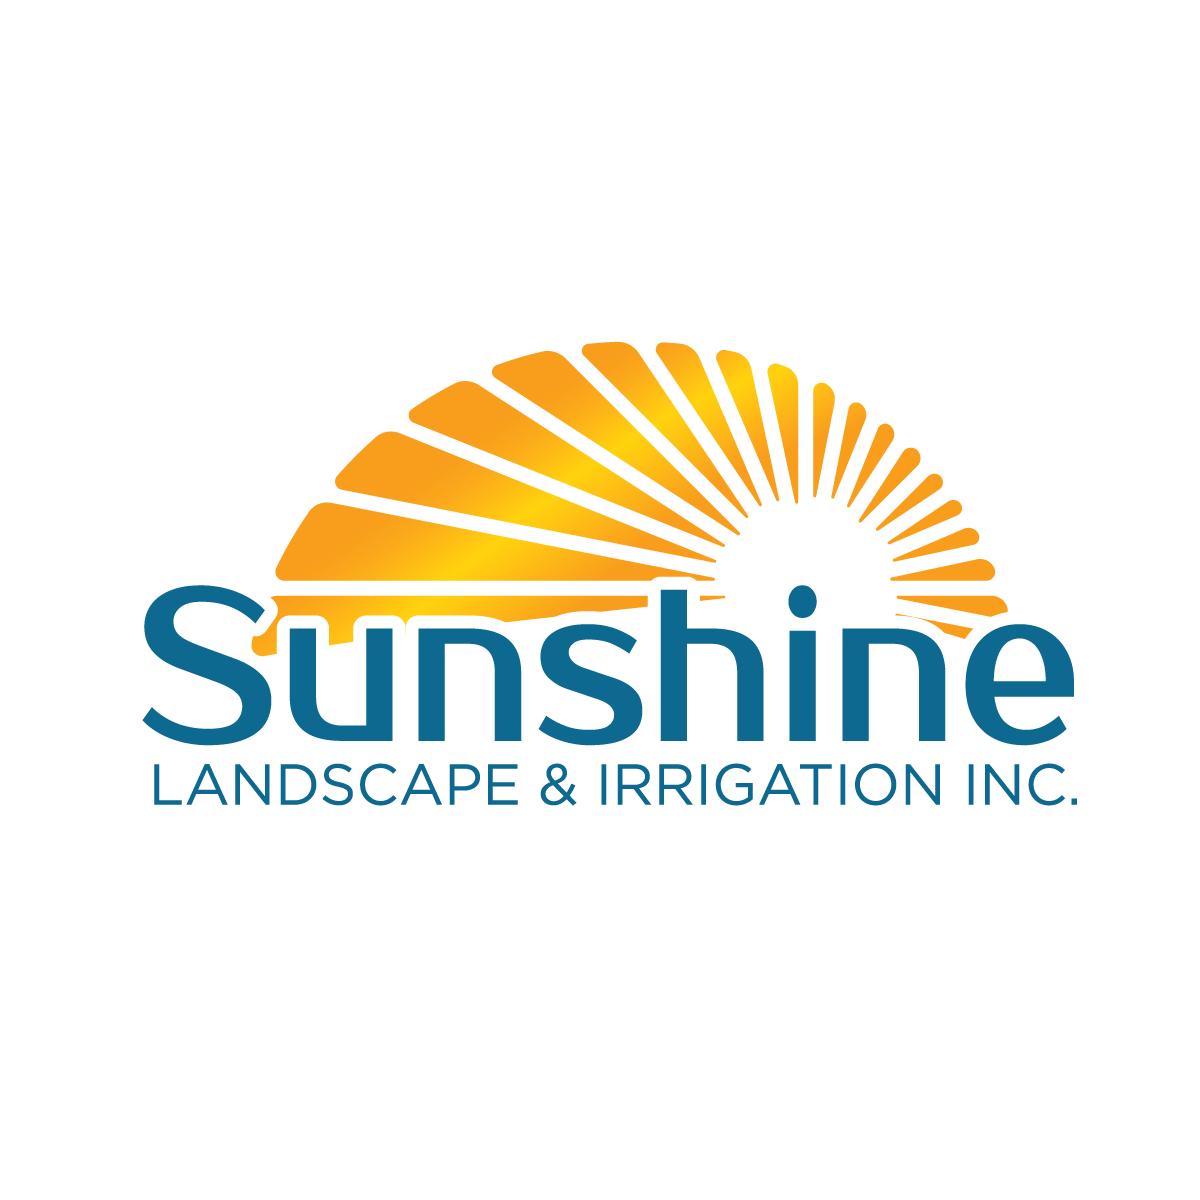 Sunshine landscape & irrrigation